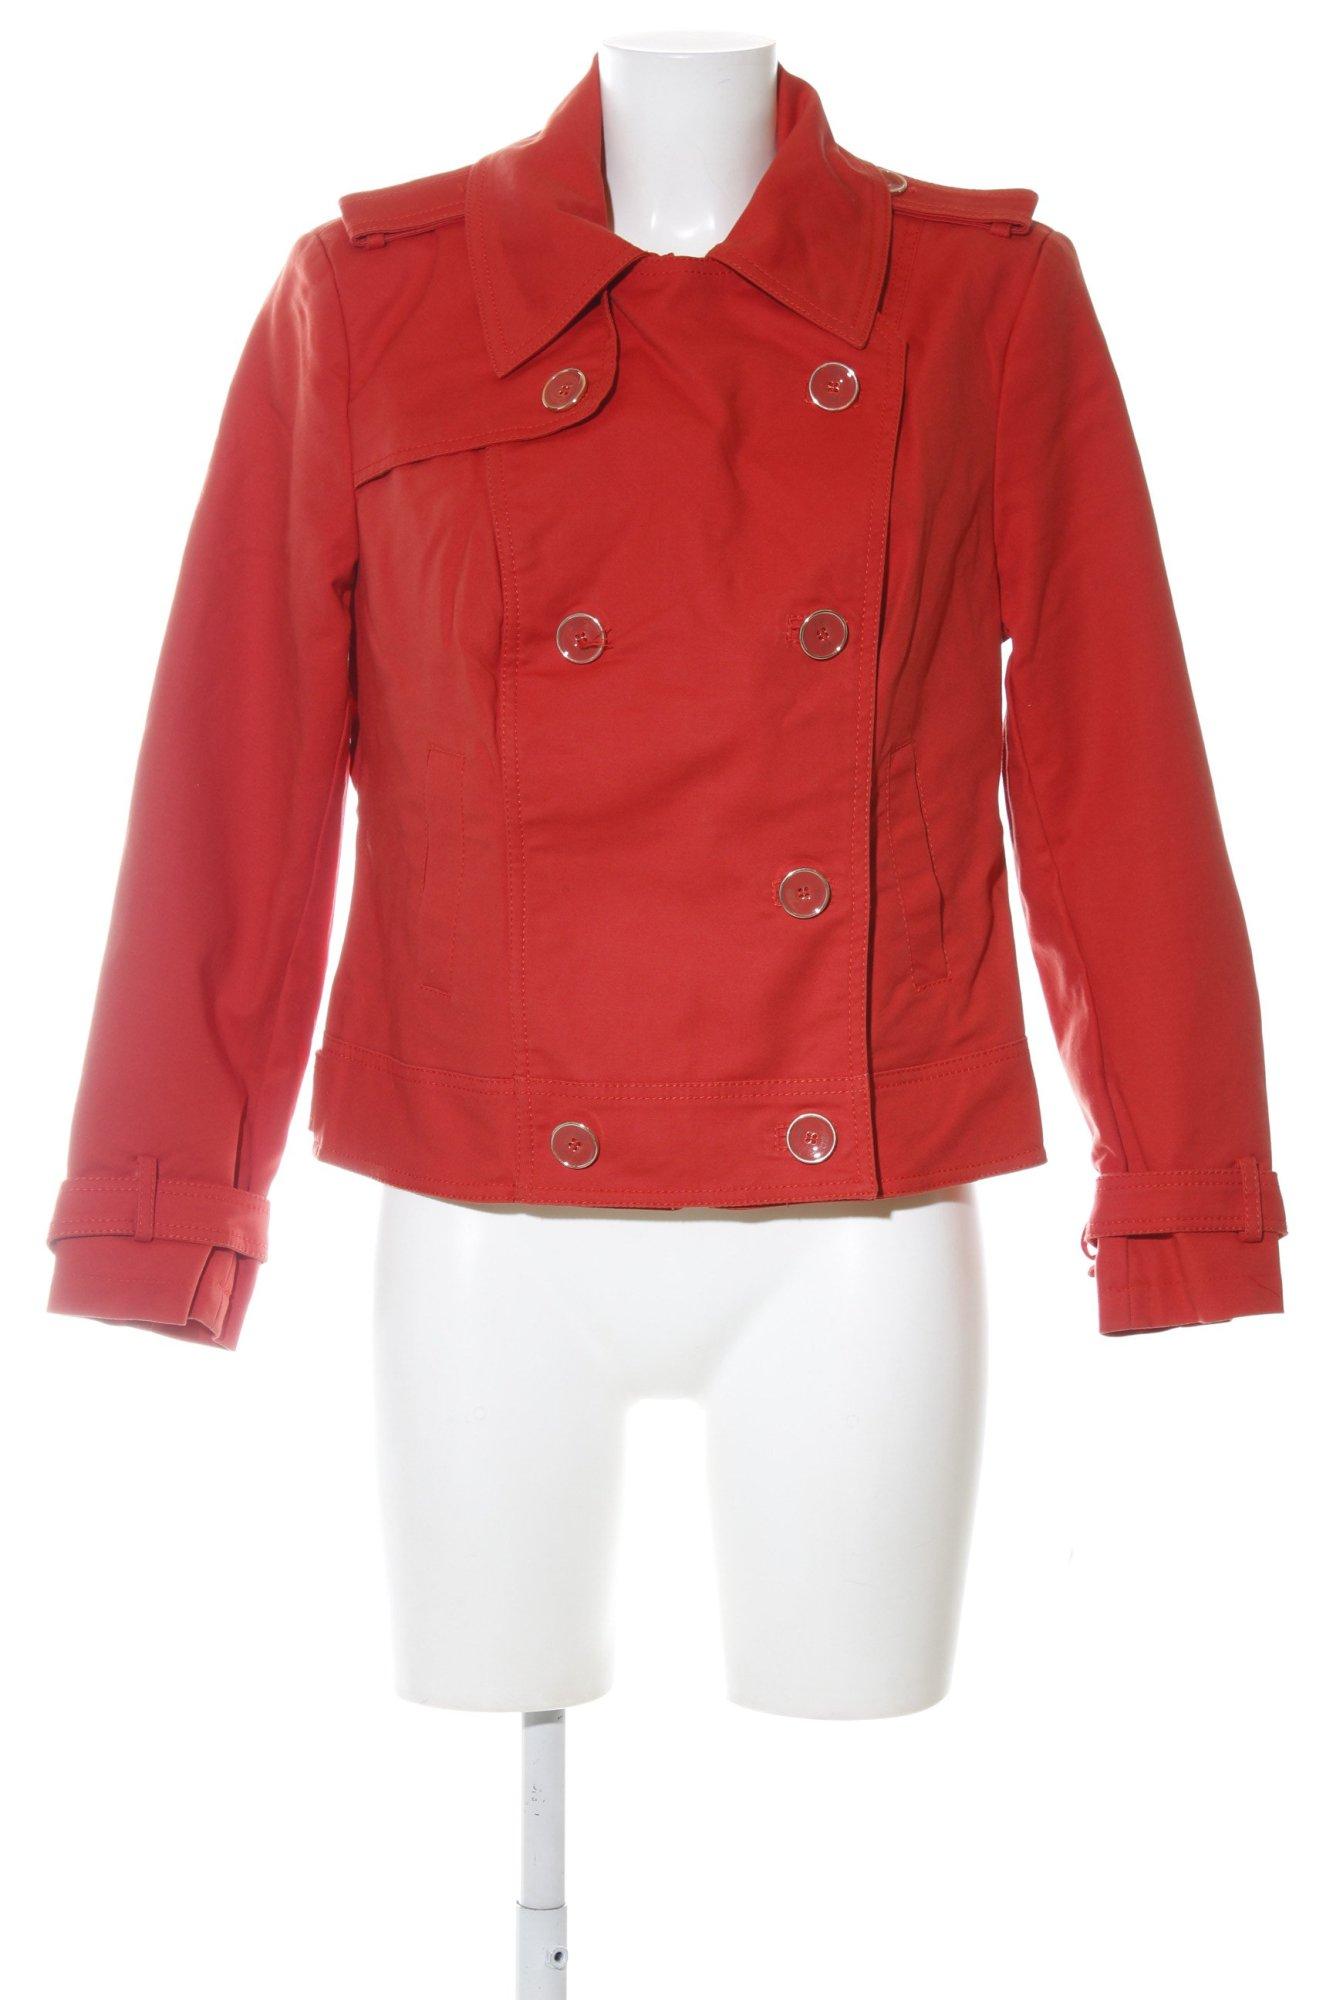 Casual Taille FR C Look veste pea 44 a Rouge Cabanjacke jacket Femmes JacketeBay JTlKF1c3